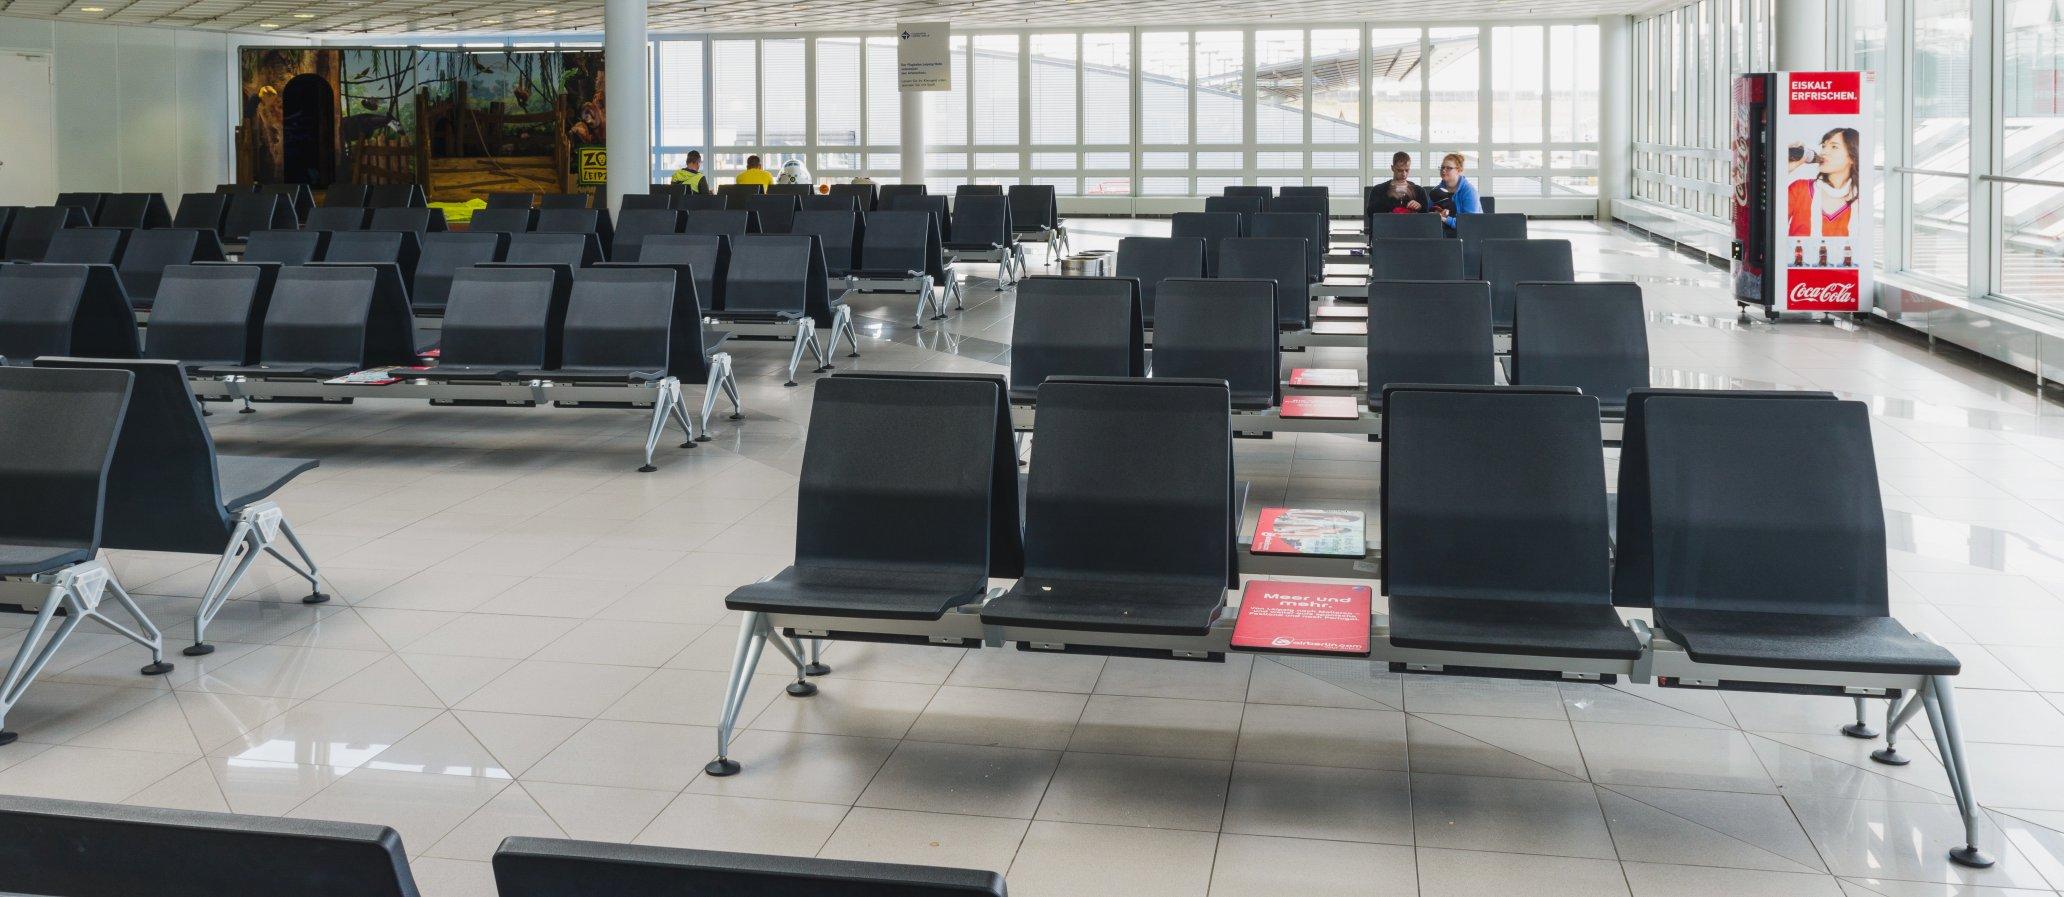 USM Airport Halle-Leipzig